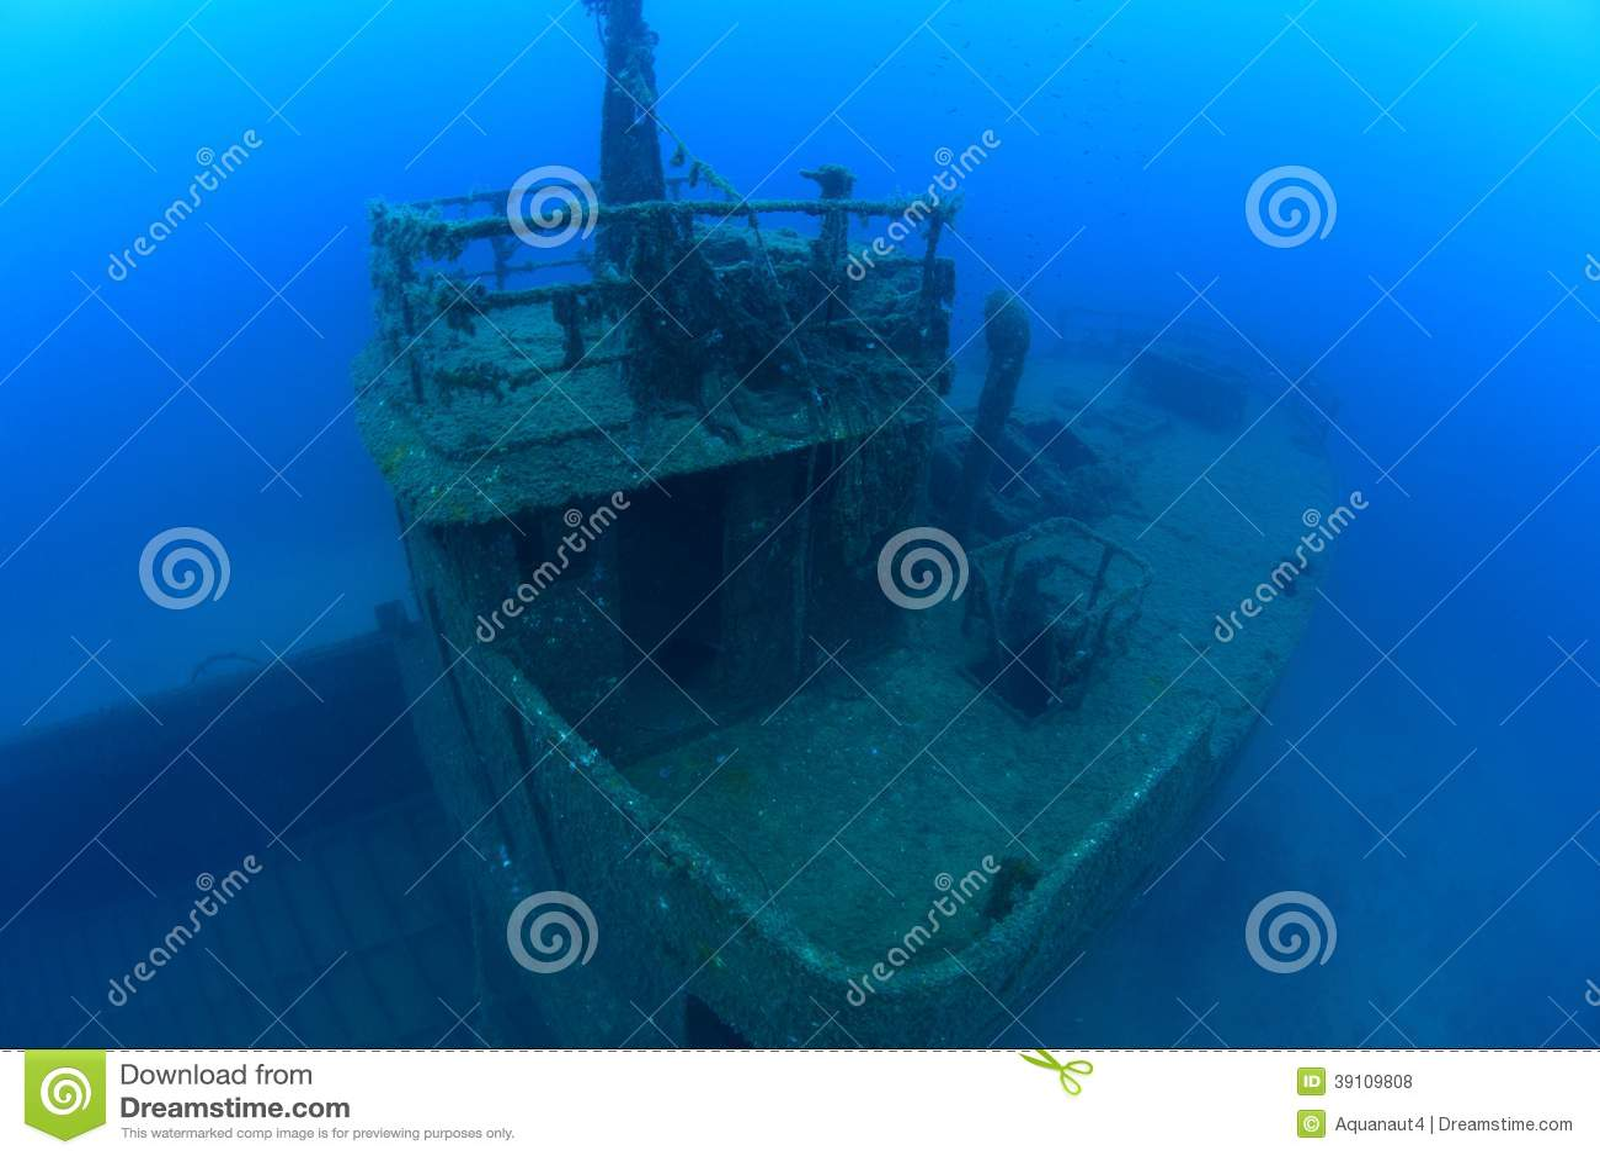 Schipbreuk in de Middellandse Zee